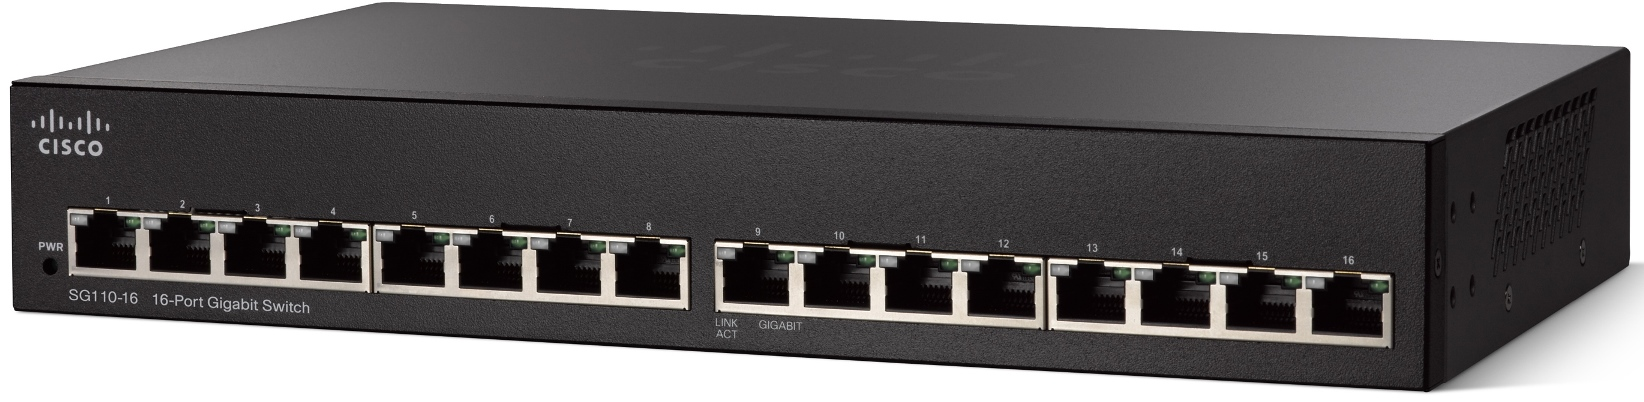 Cisco SG110-16 16-Port Gigabit Switch